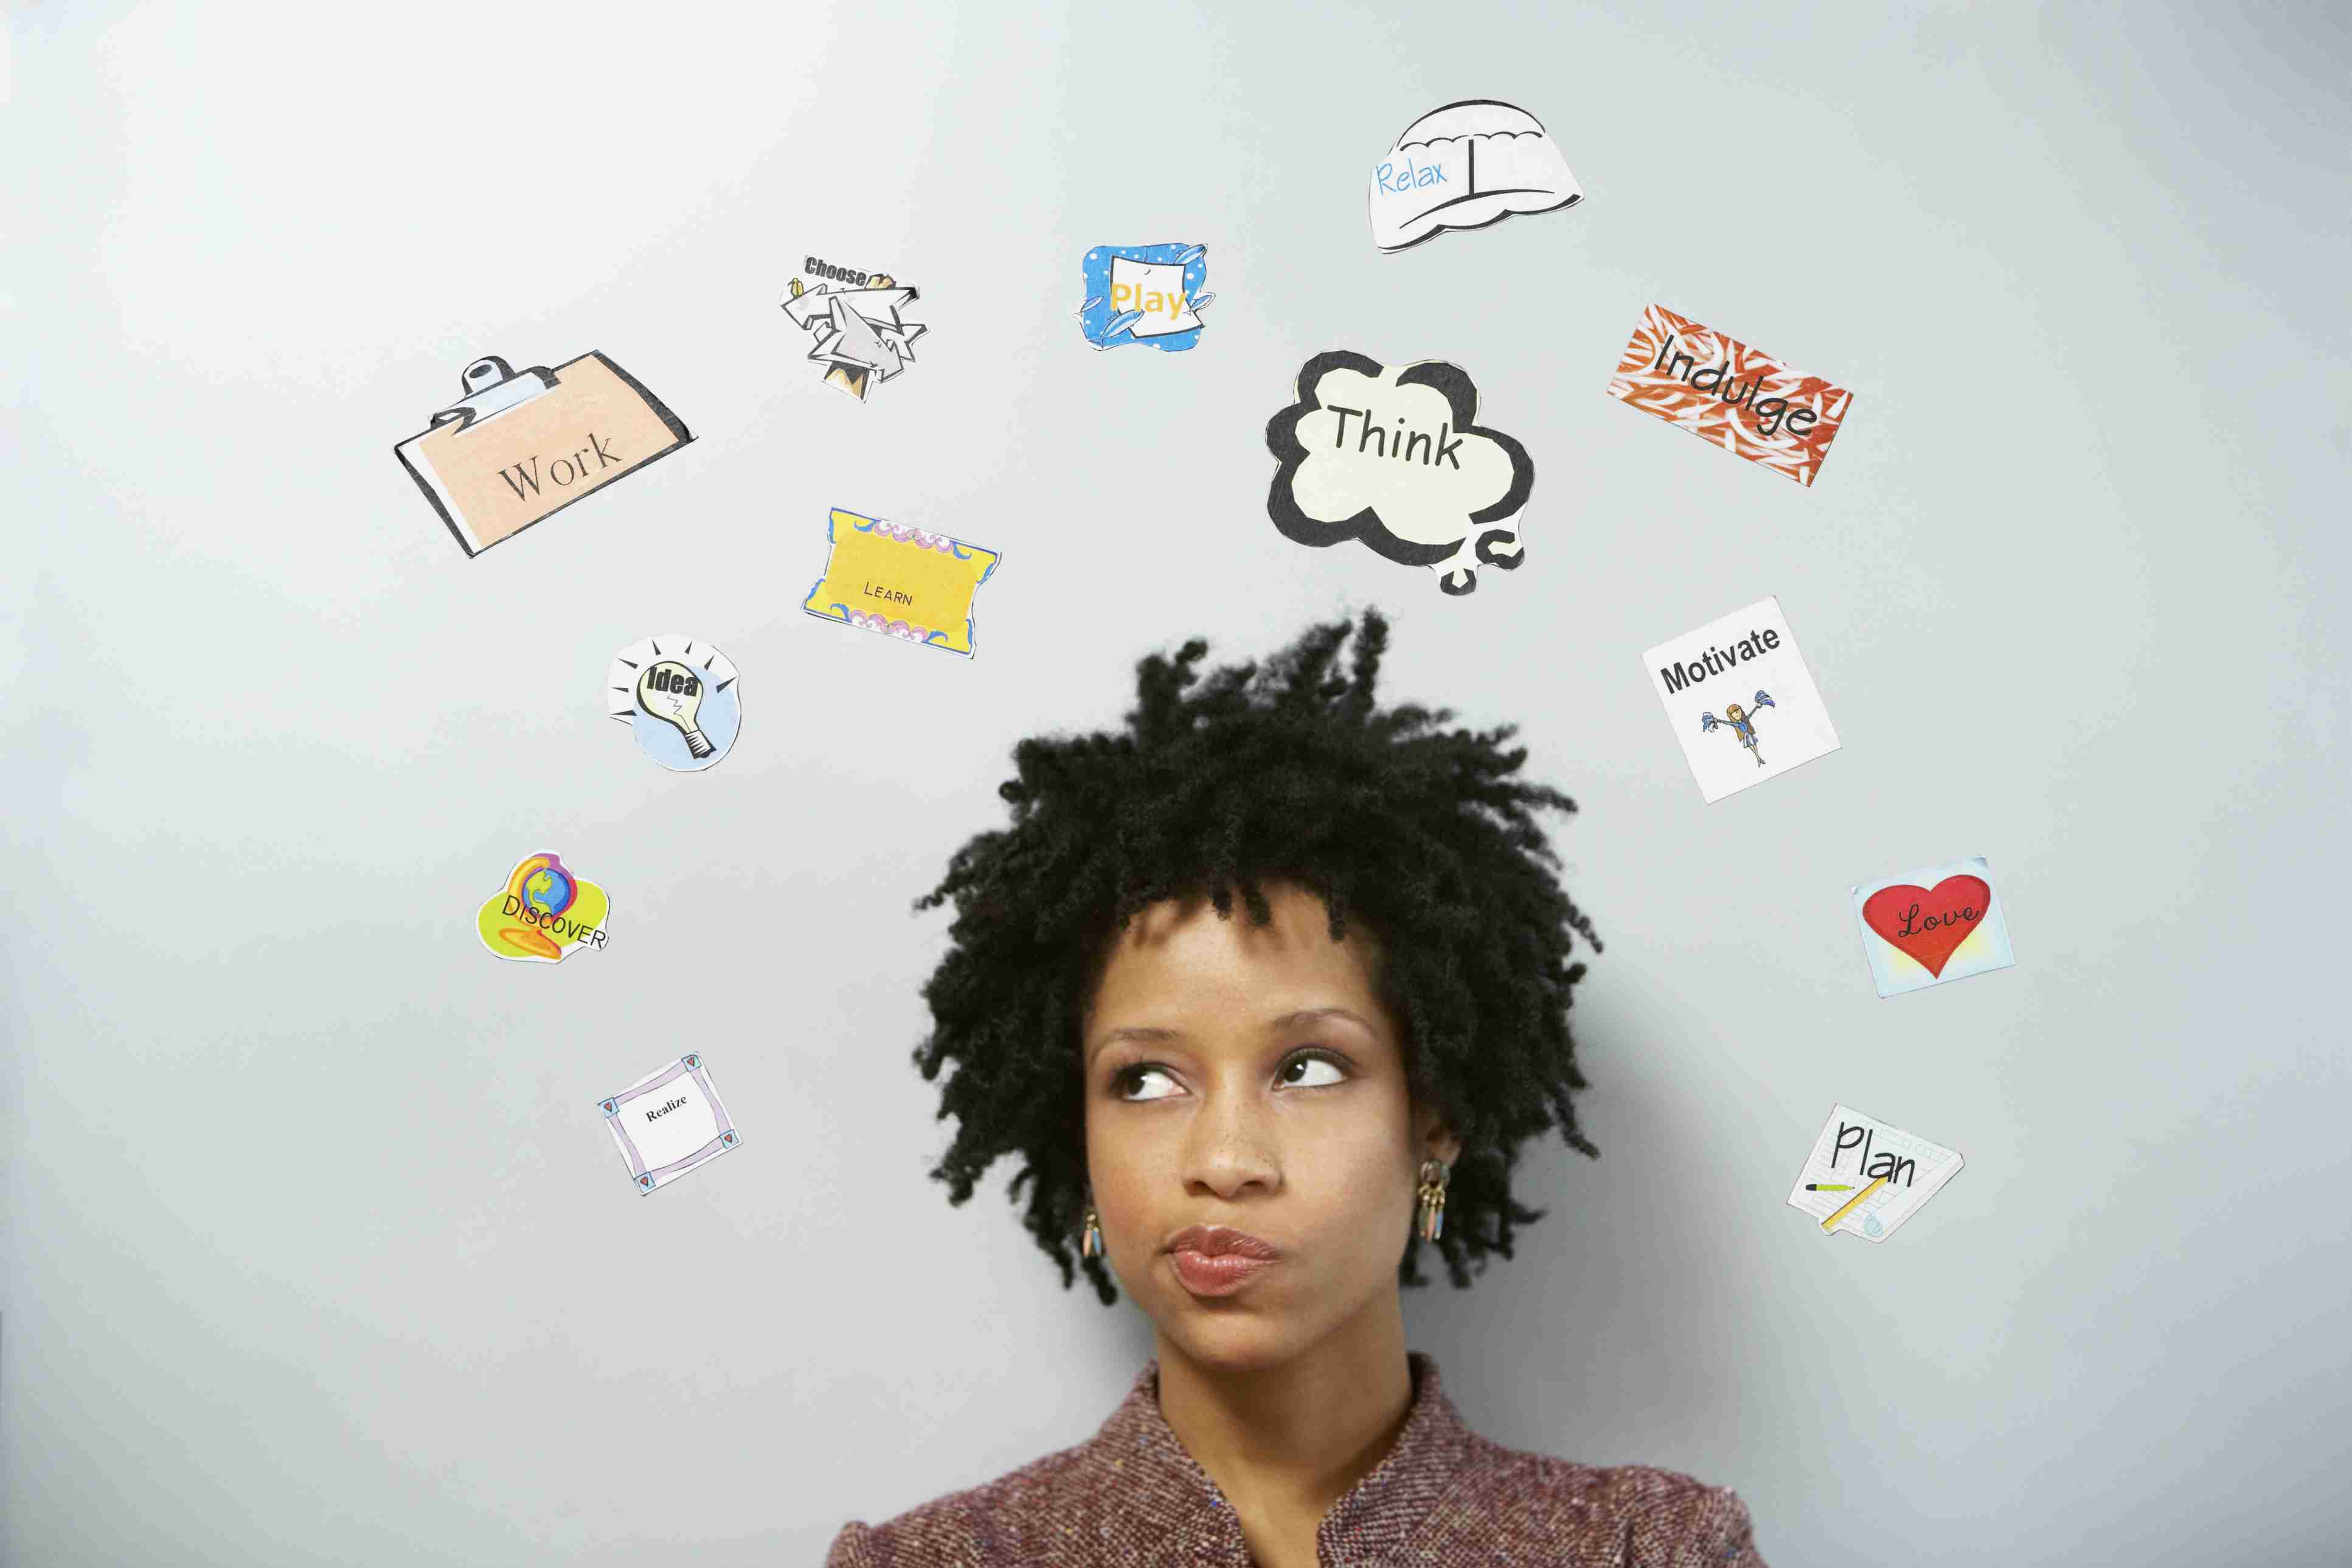 Emotions help us make decisions